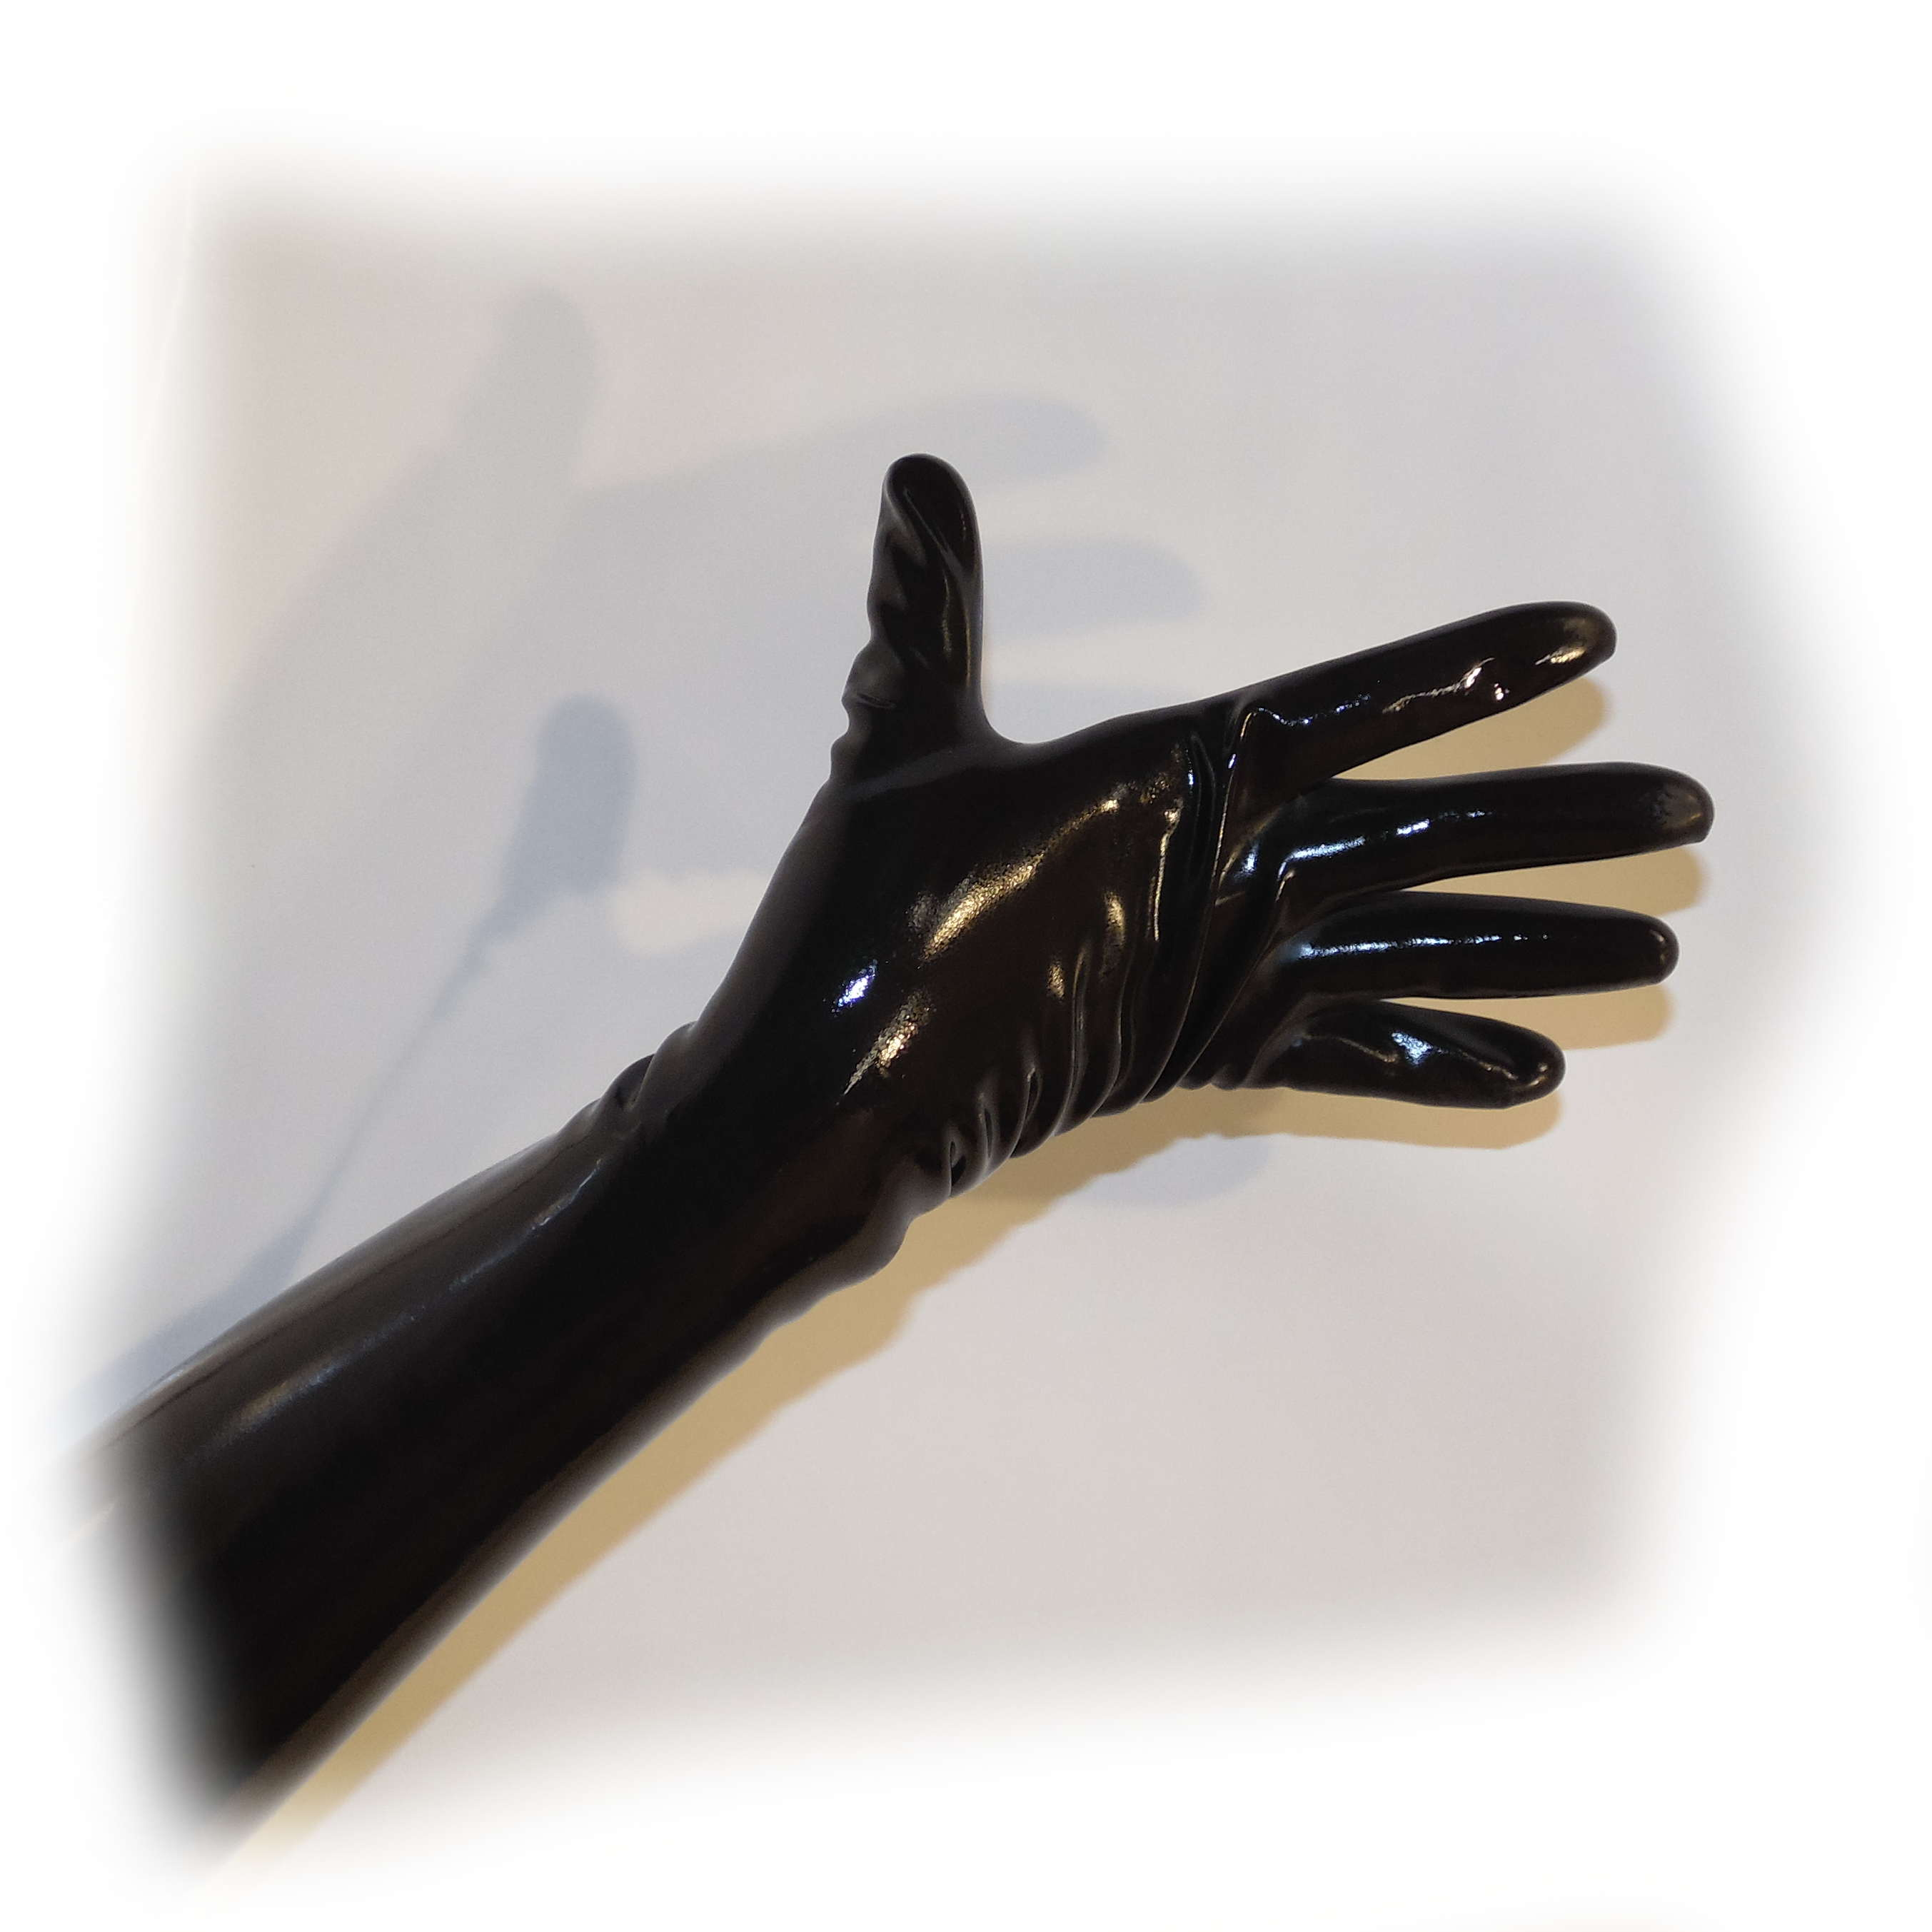 Latex Glove Schwarz extra heiß - 0,3 mm starkes Materia Size M (2015) 2